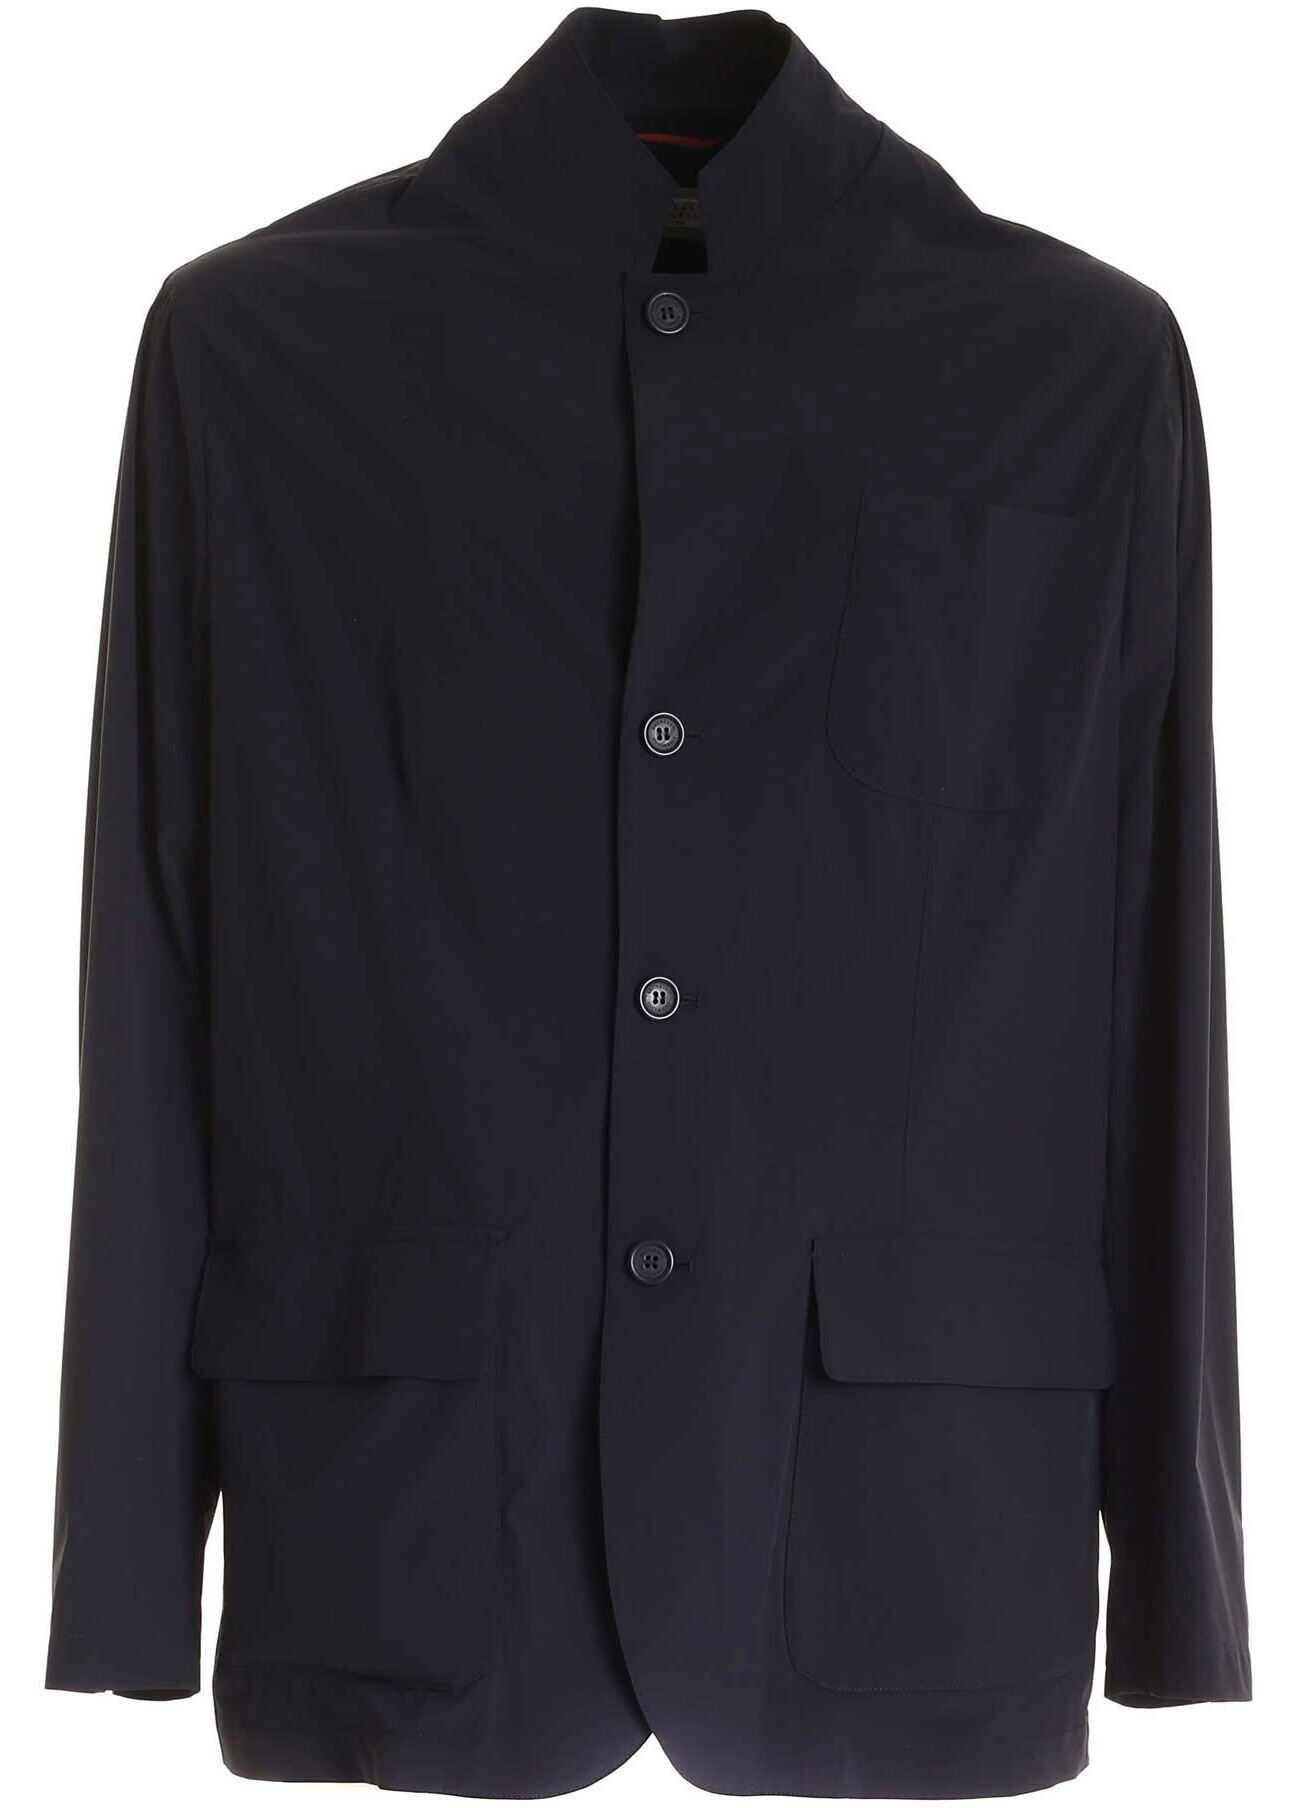 Brunello Cucinelli Pockets Jacket In Blue Blue imagine